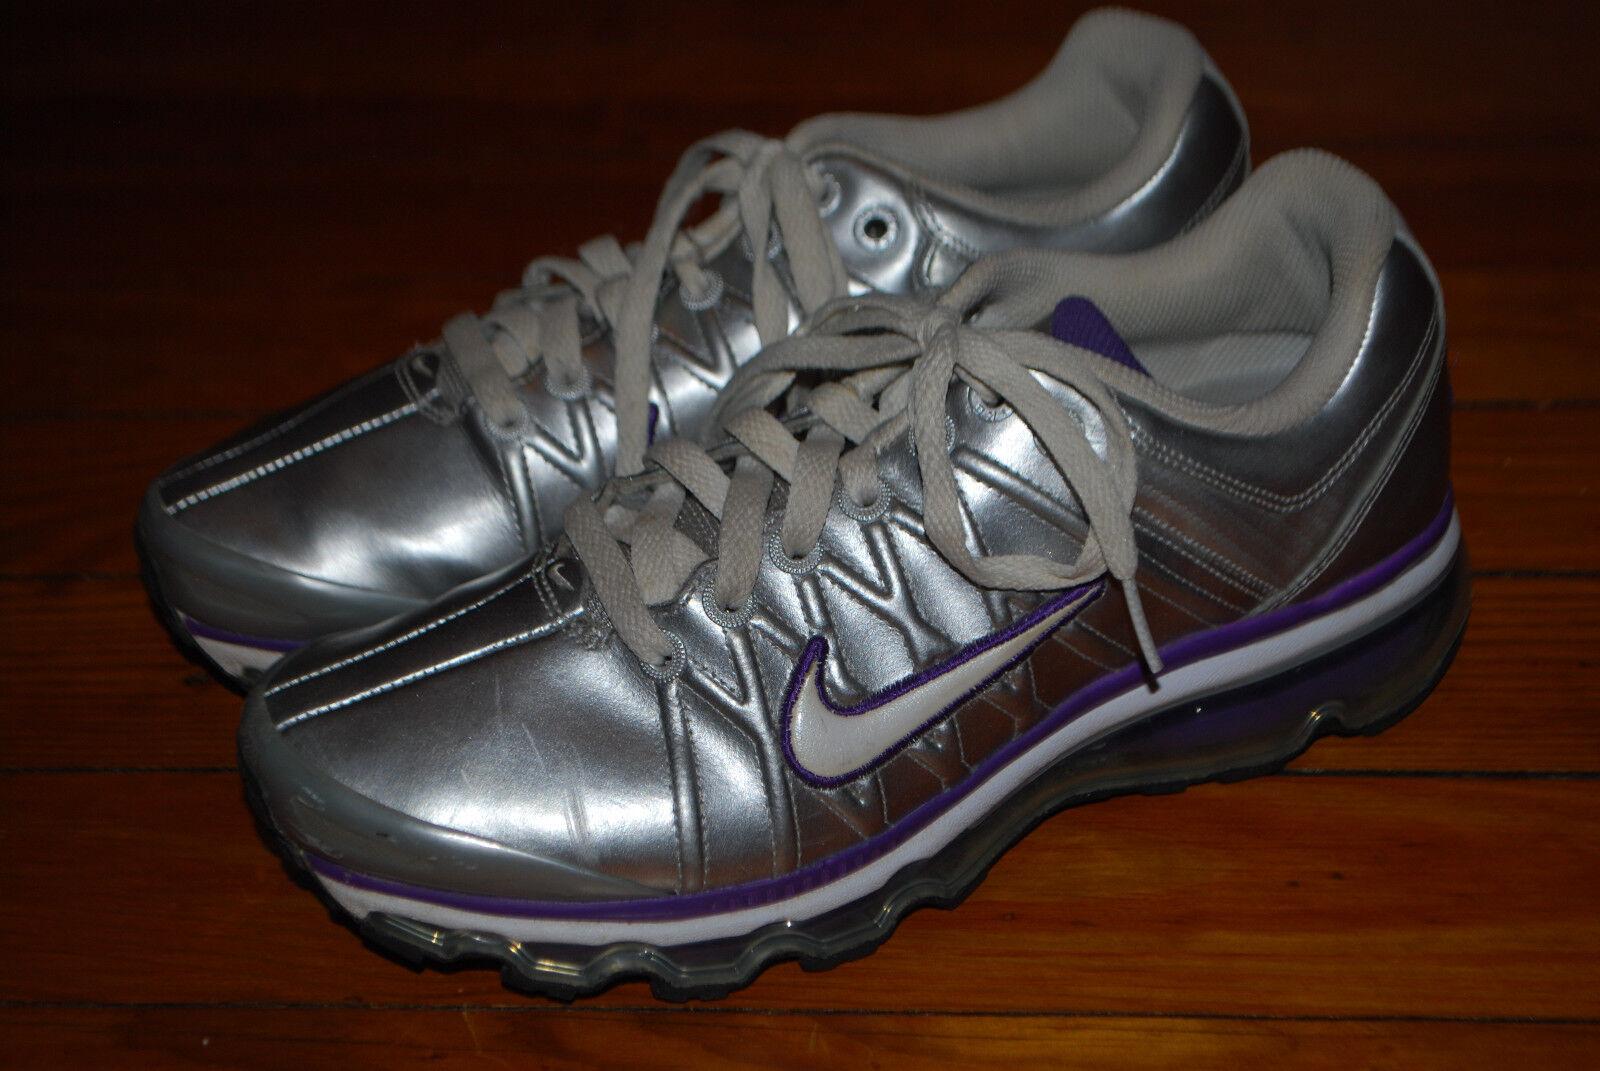 Women's Nike Women's Air Max+ Max+ Max+ 2009 Leather Running Sneaker (8.5) 401008 005 9ec738